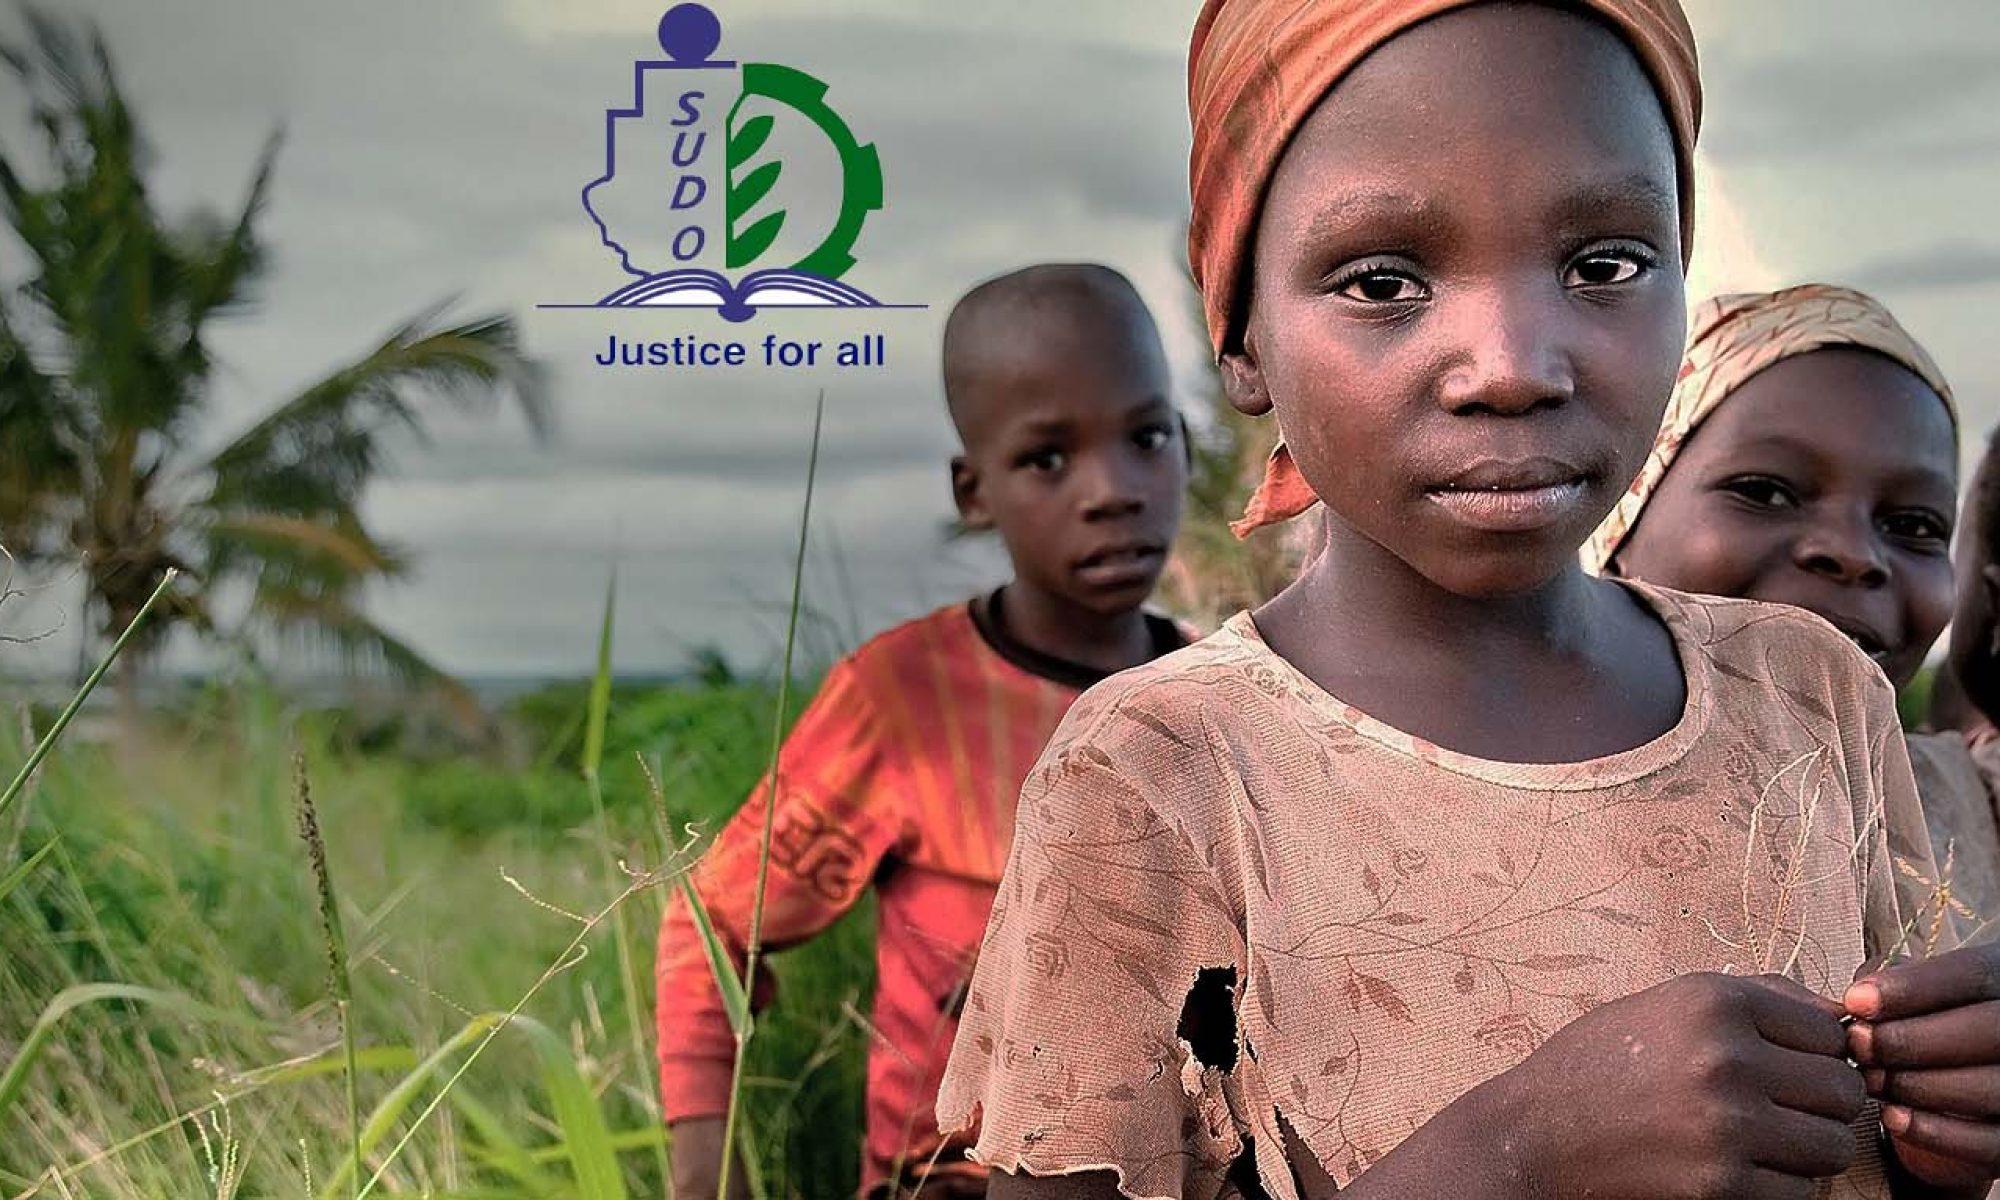 Sudan Social Devolopmet Organization